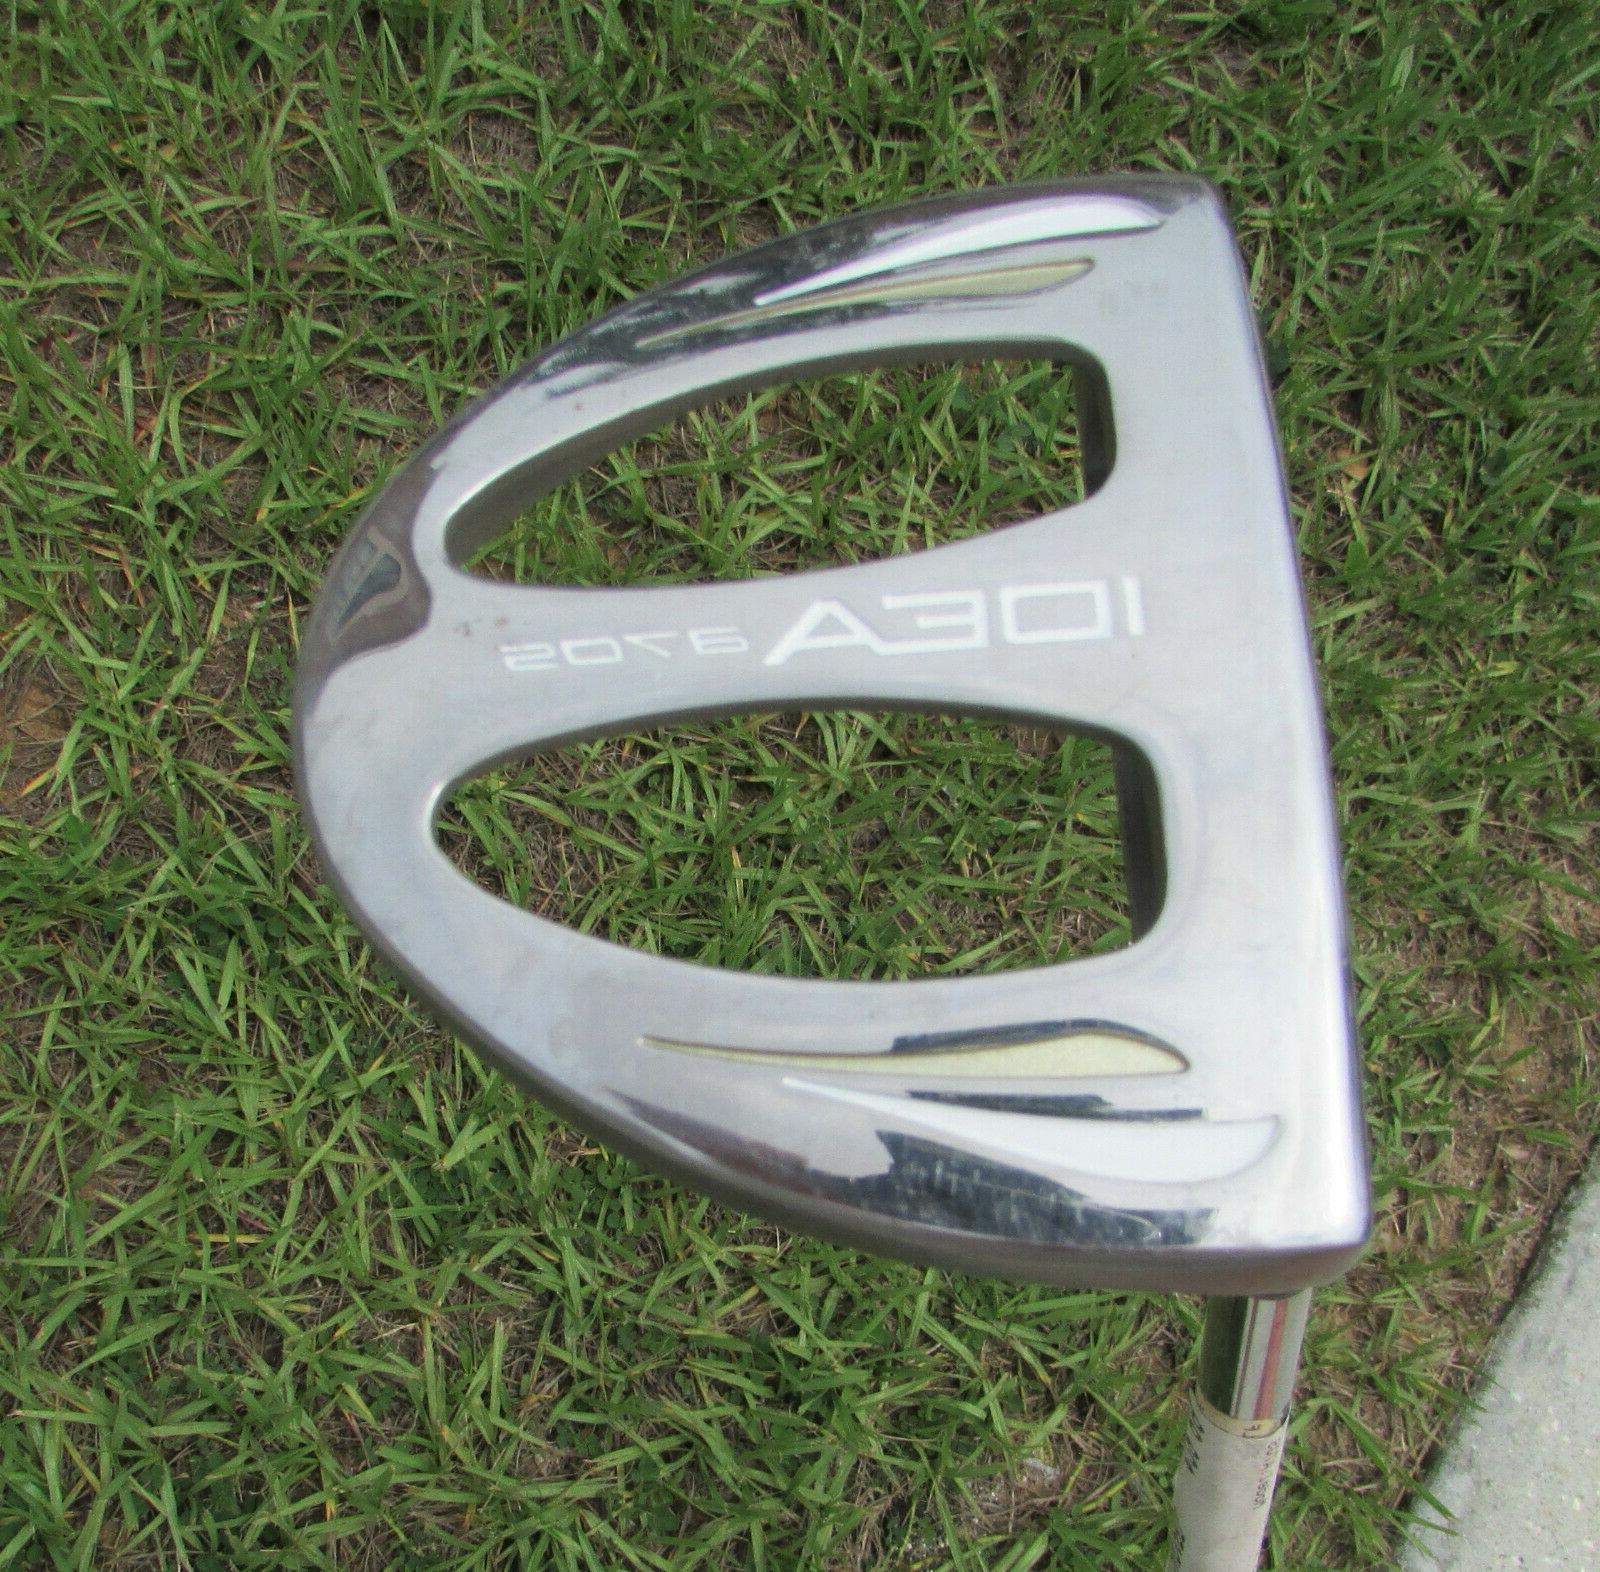 idea a705 putter 33 golf club never